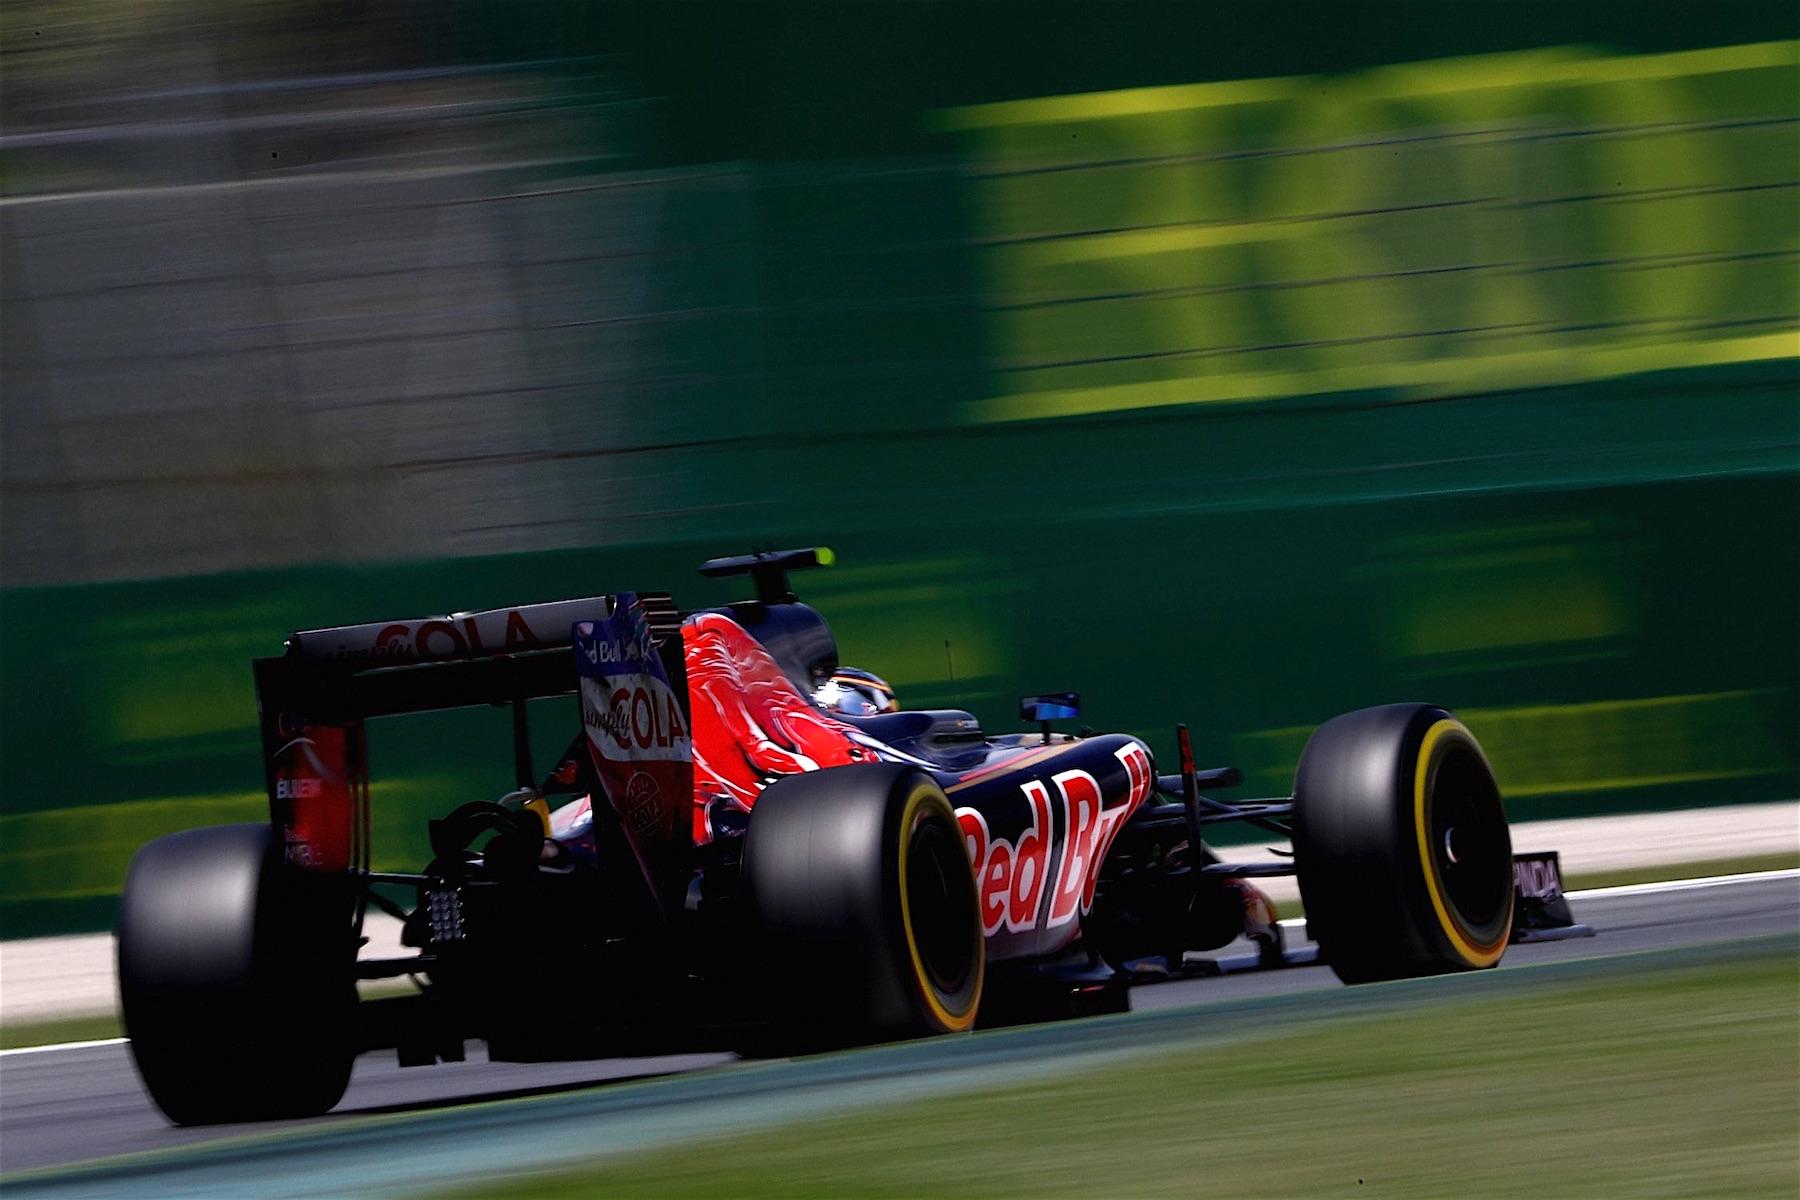 Salracing   Carlos Sainz   Scuderia Toro Rosso